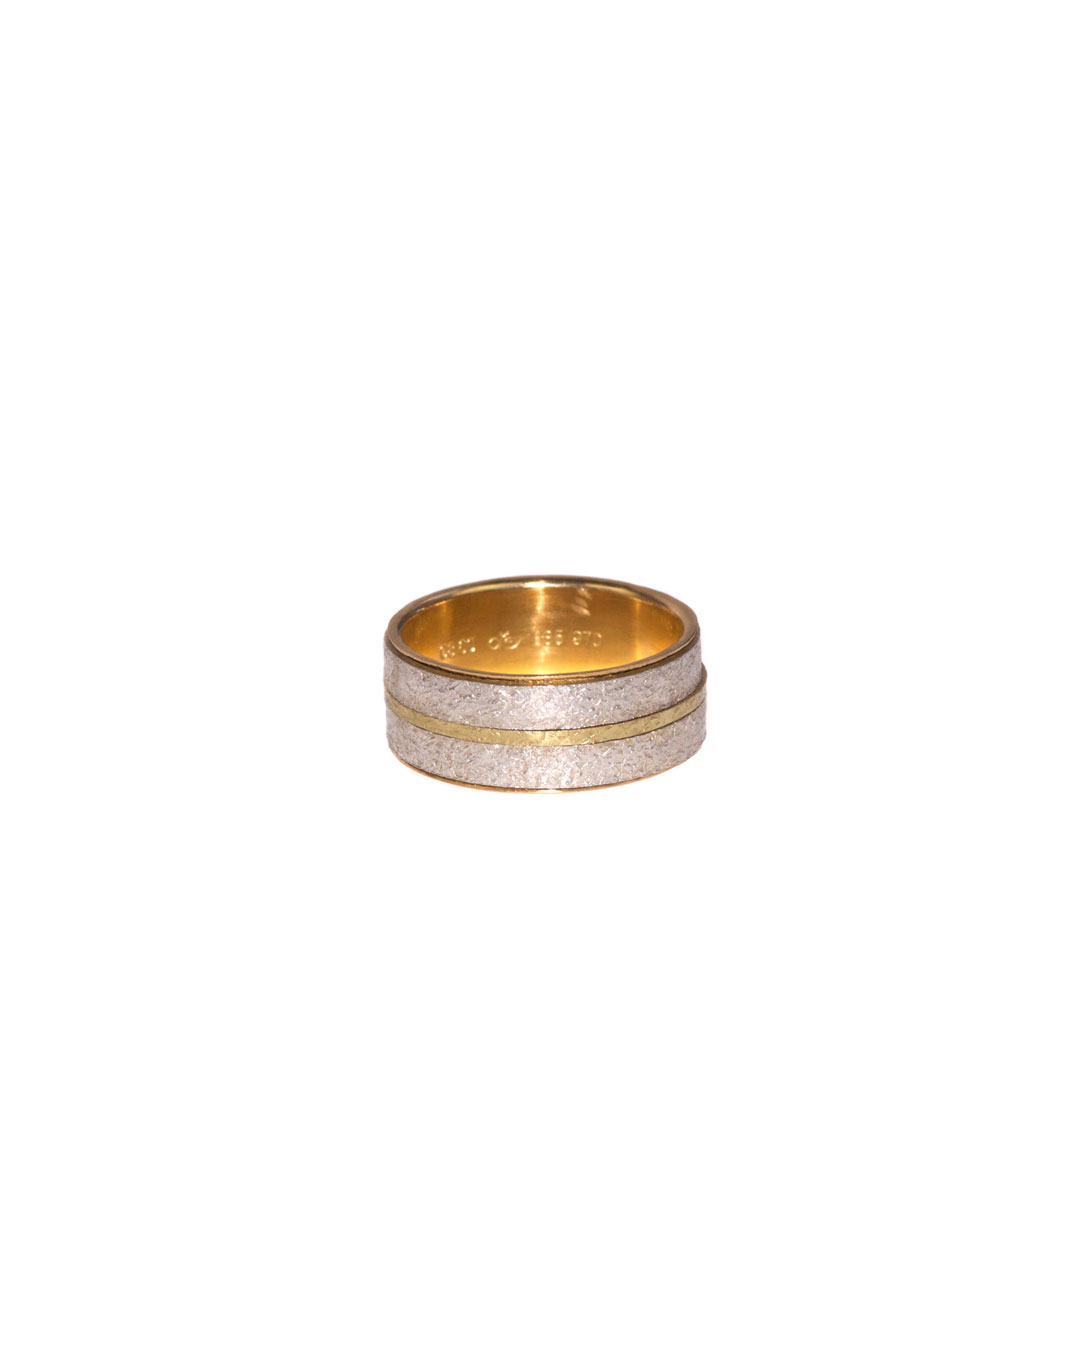 Okinari Kurokawa, untitled, 2008, ring; 20ct gold, 970 silver, 20 x 8 mm